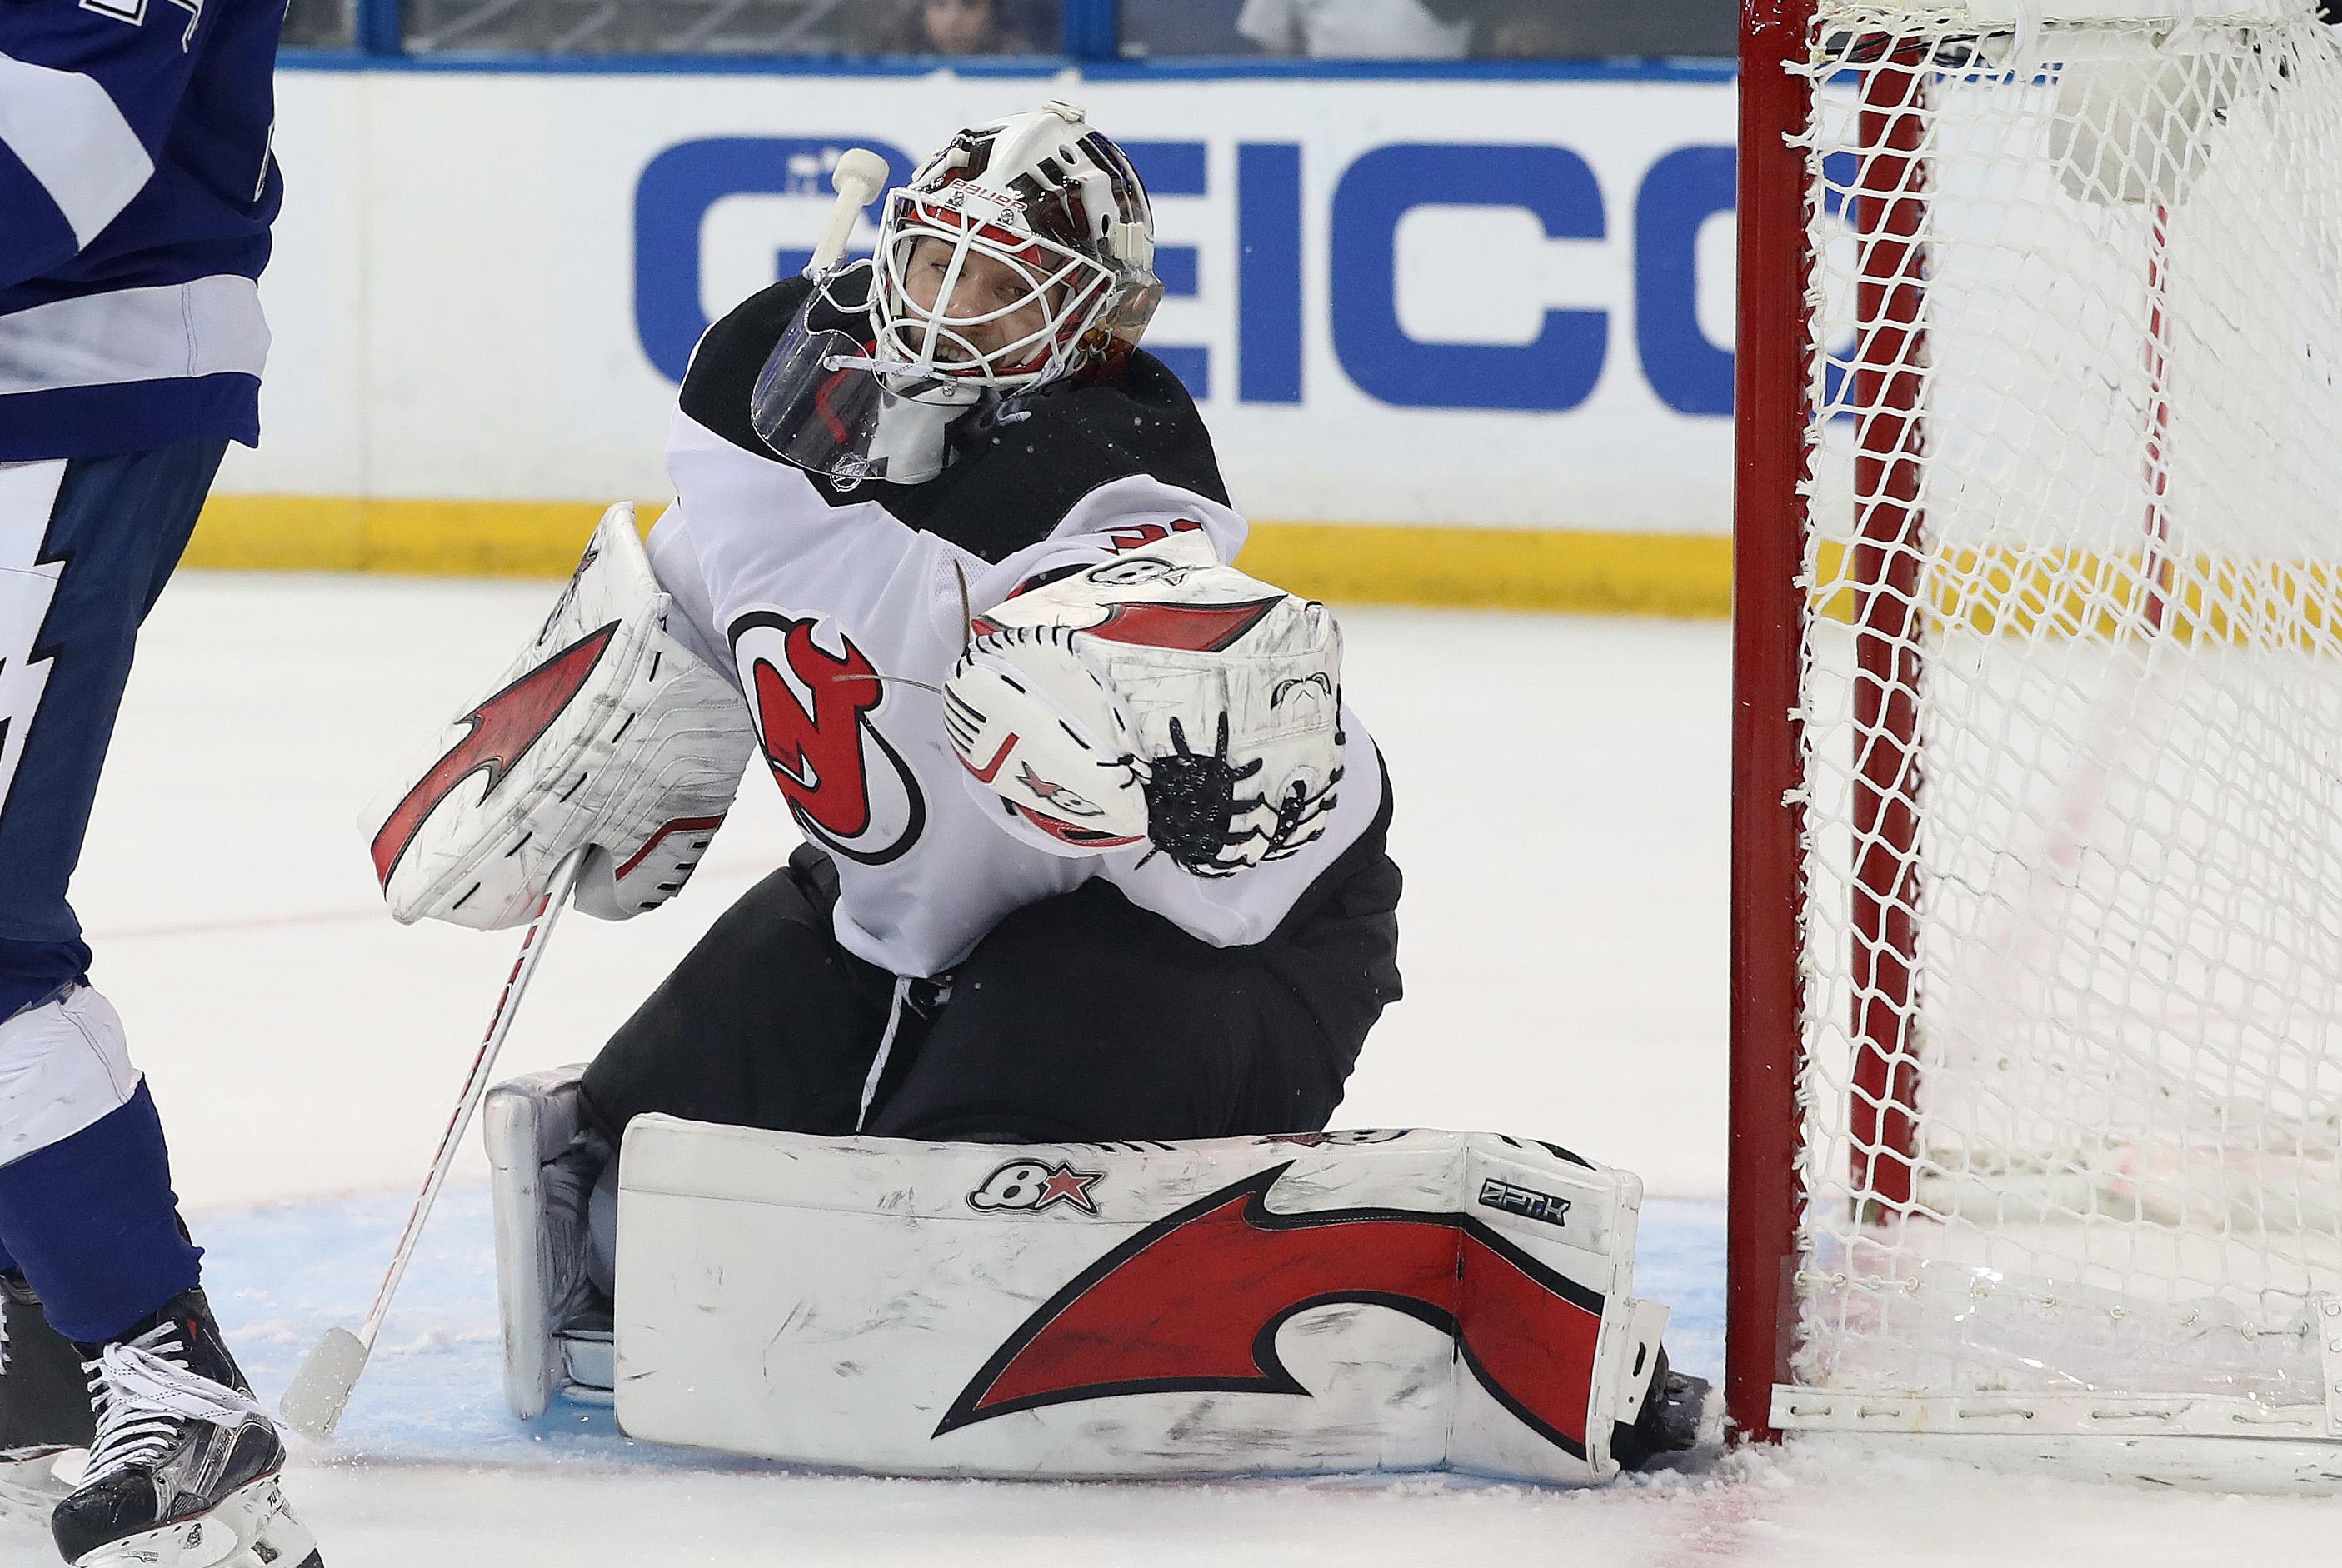 Former NHL goaltender Eddie Lack retires at age 32